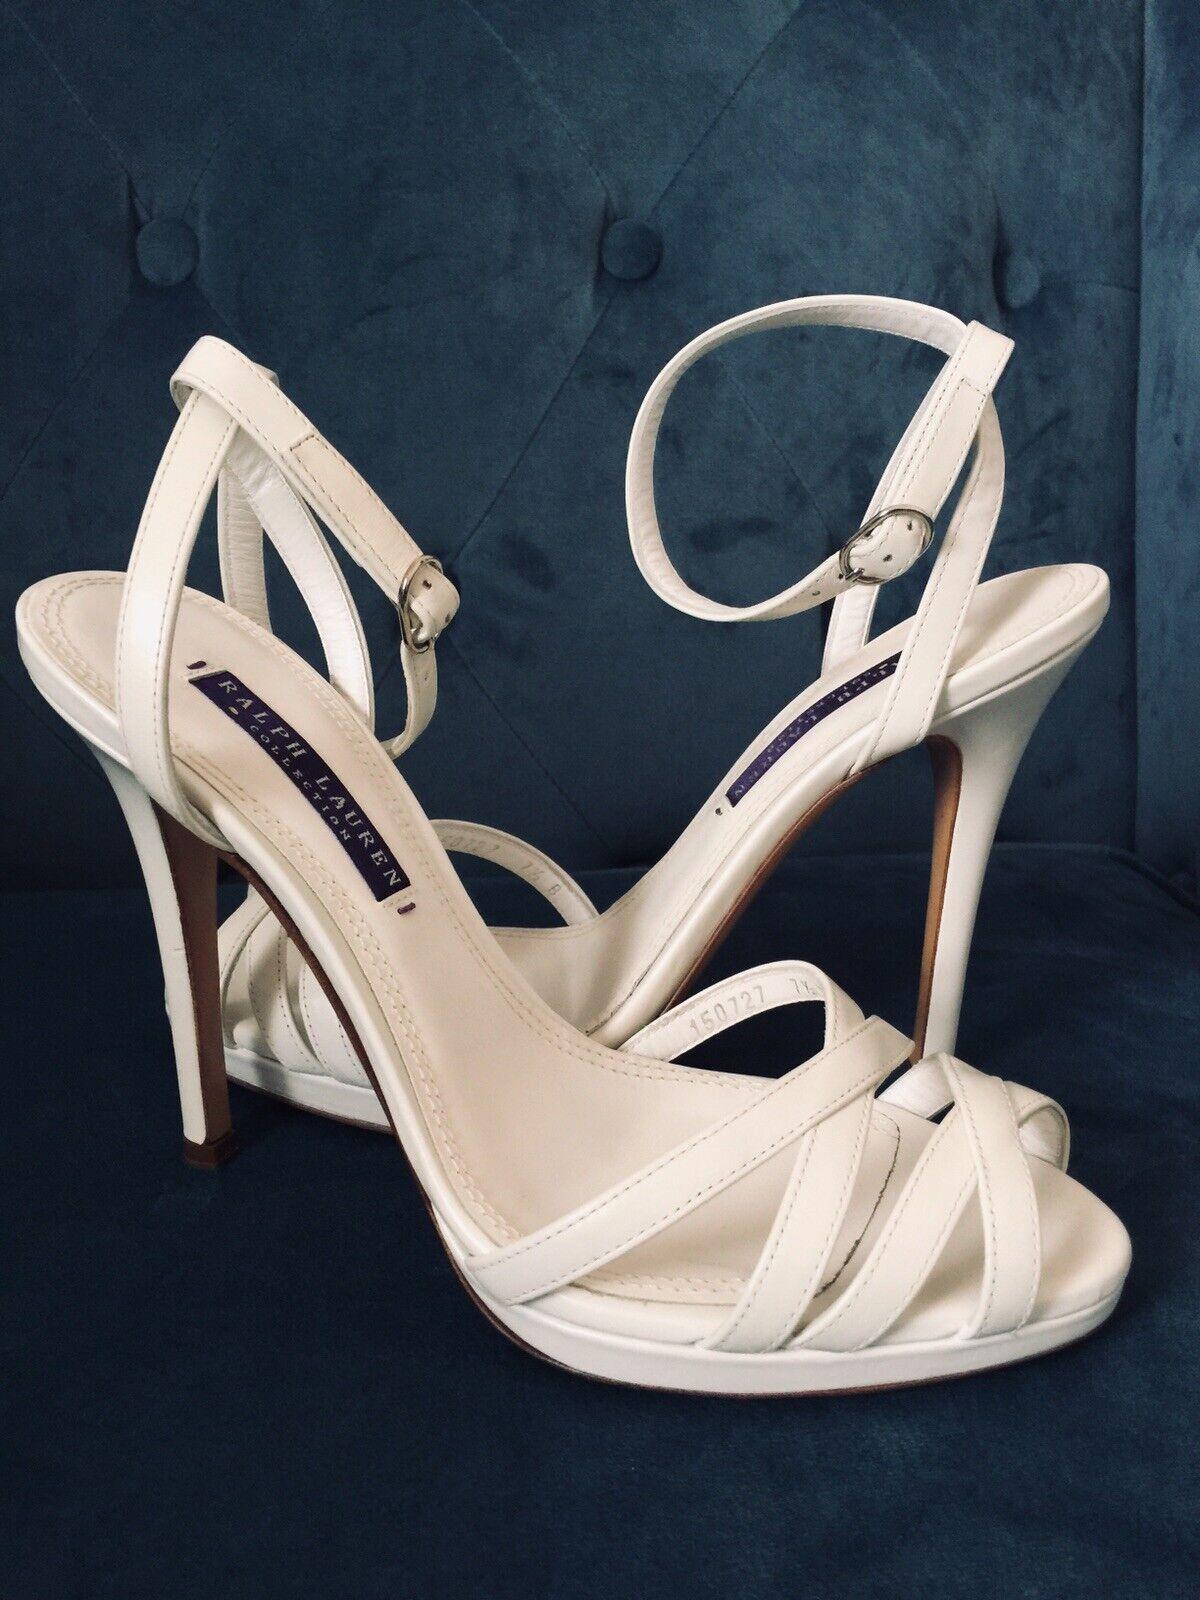 migliore offerta Authentic Ralph Lauren Collection bianca Leather Leather Leather Sandal Heels Dimensione 7.5  edizione limitata